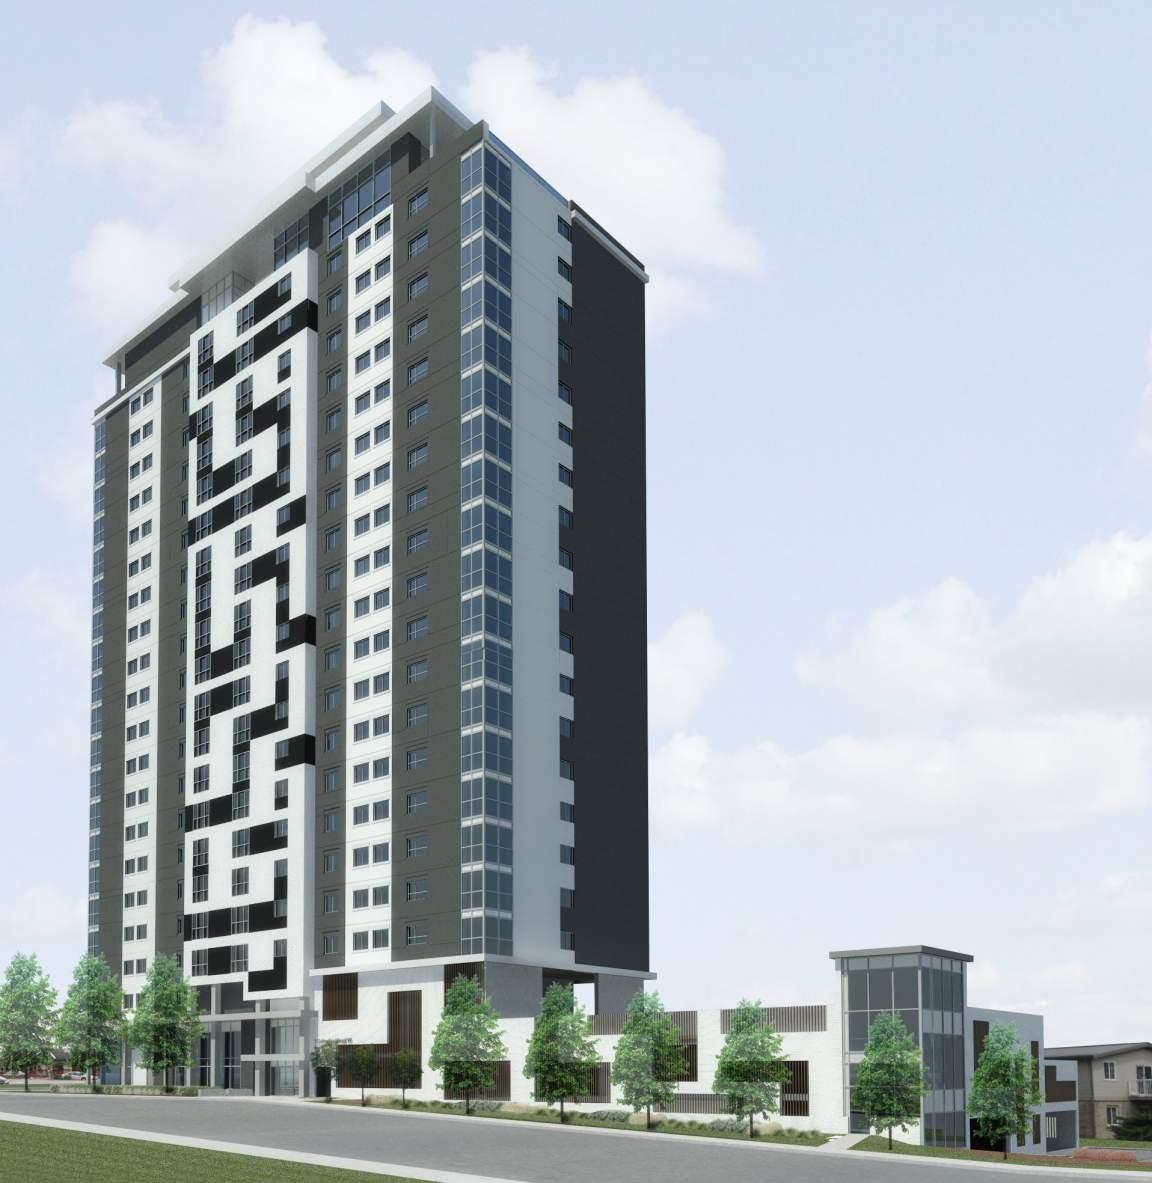 Kijiji Kitchener Waterloo Furniture 26 75 Columbia Waterloo On Apartments For Rent Listing Id